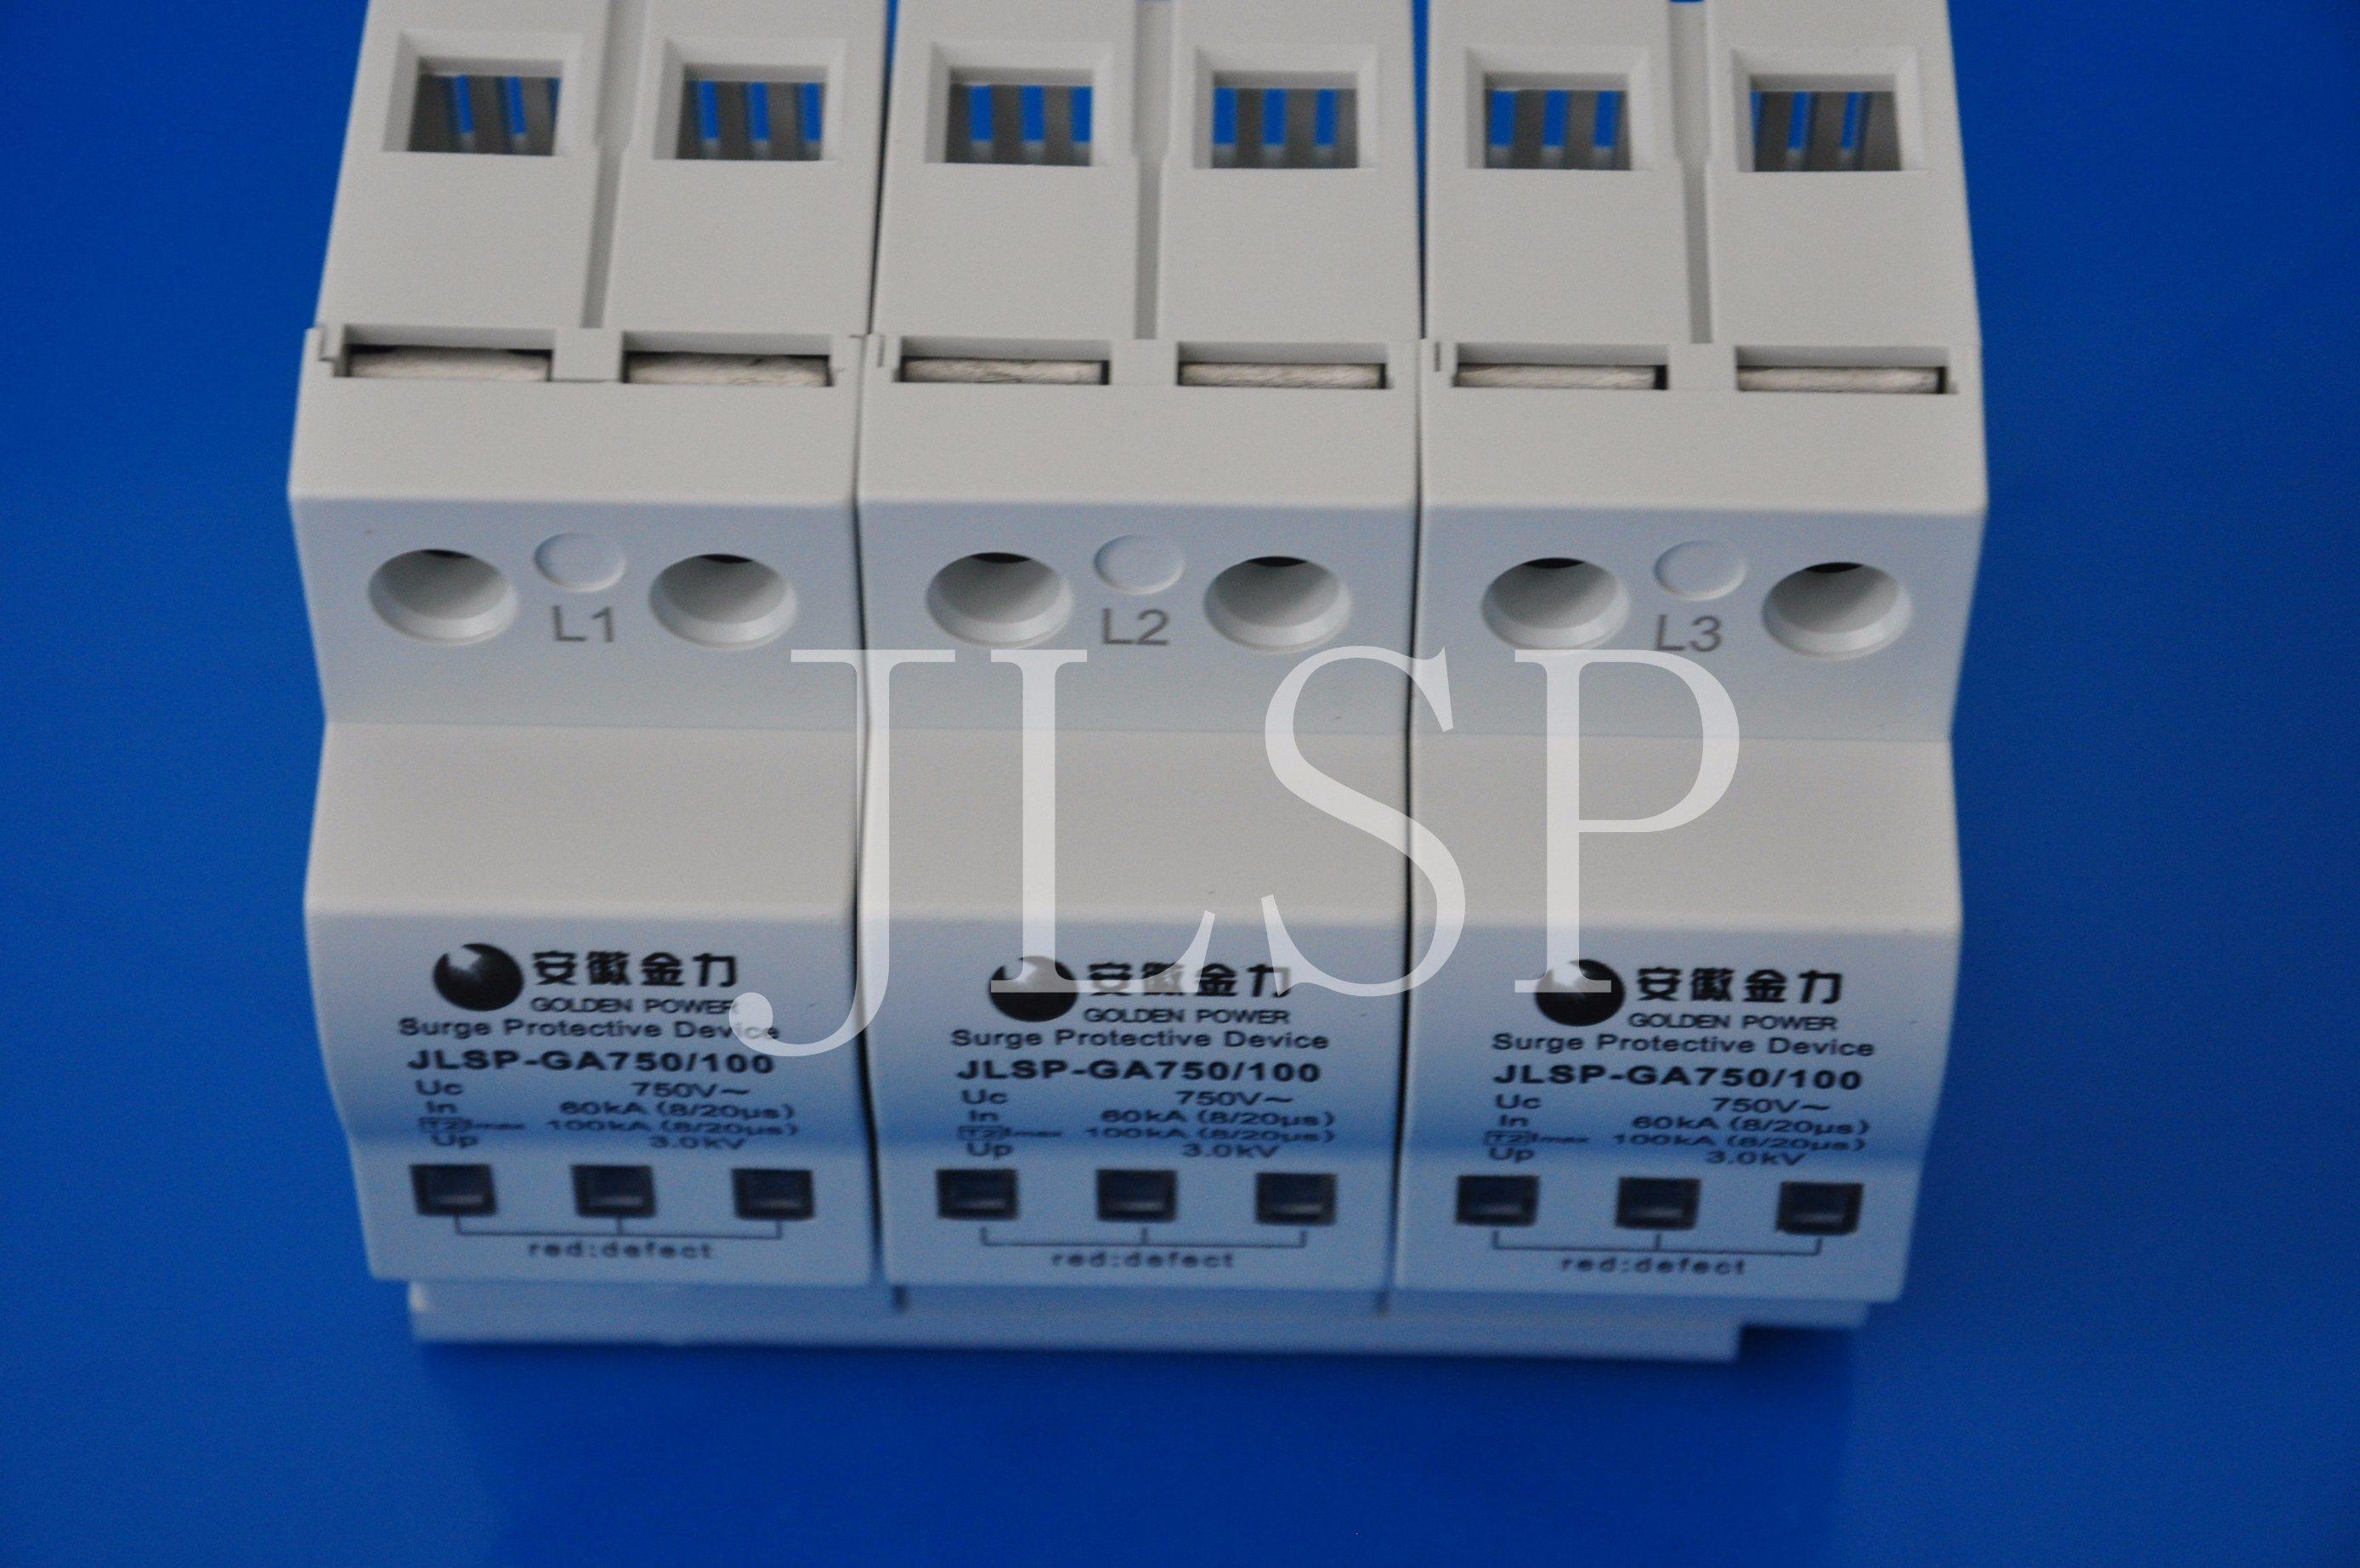 PV Application 20-40ka Solar 3p DC 1000V Jlsp-Ga750-100 Surge Protector, 17004